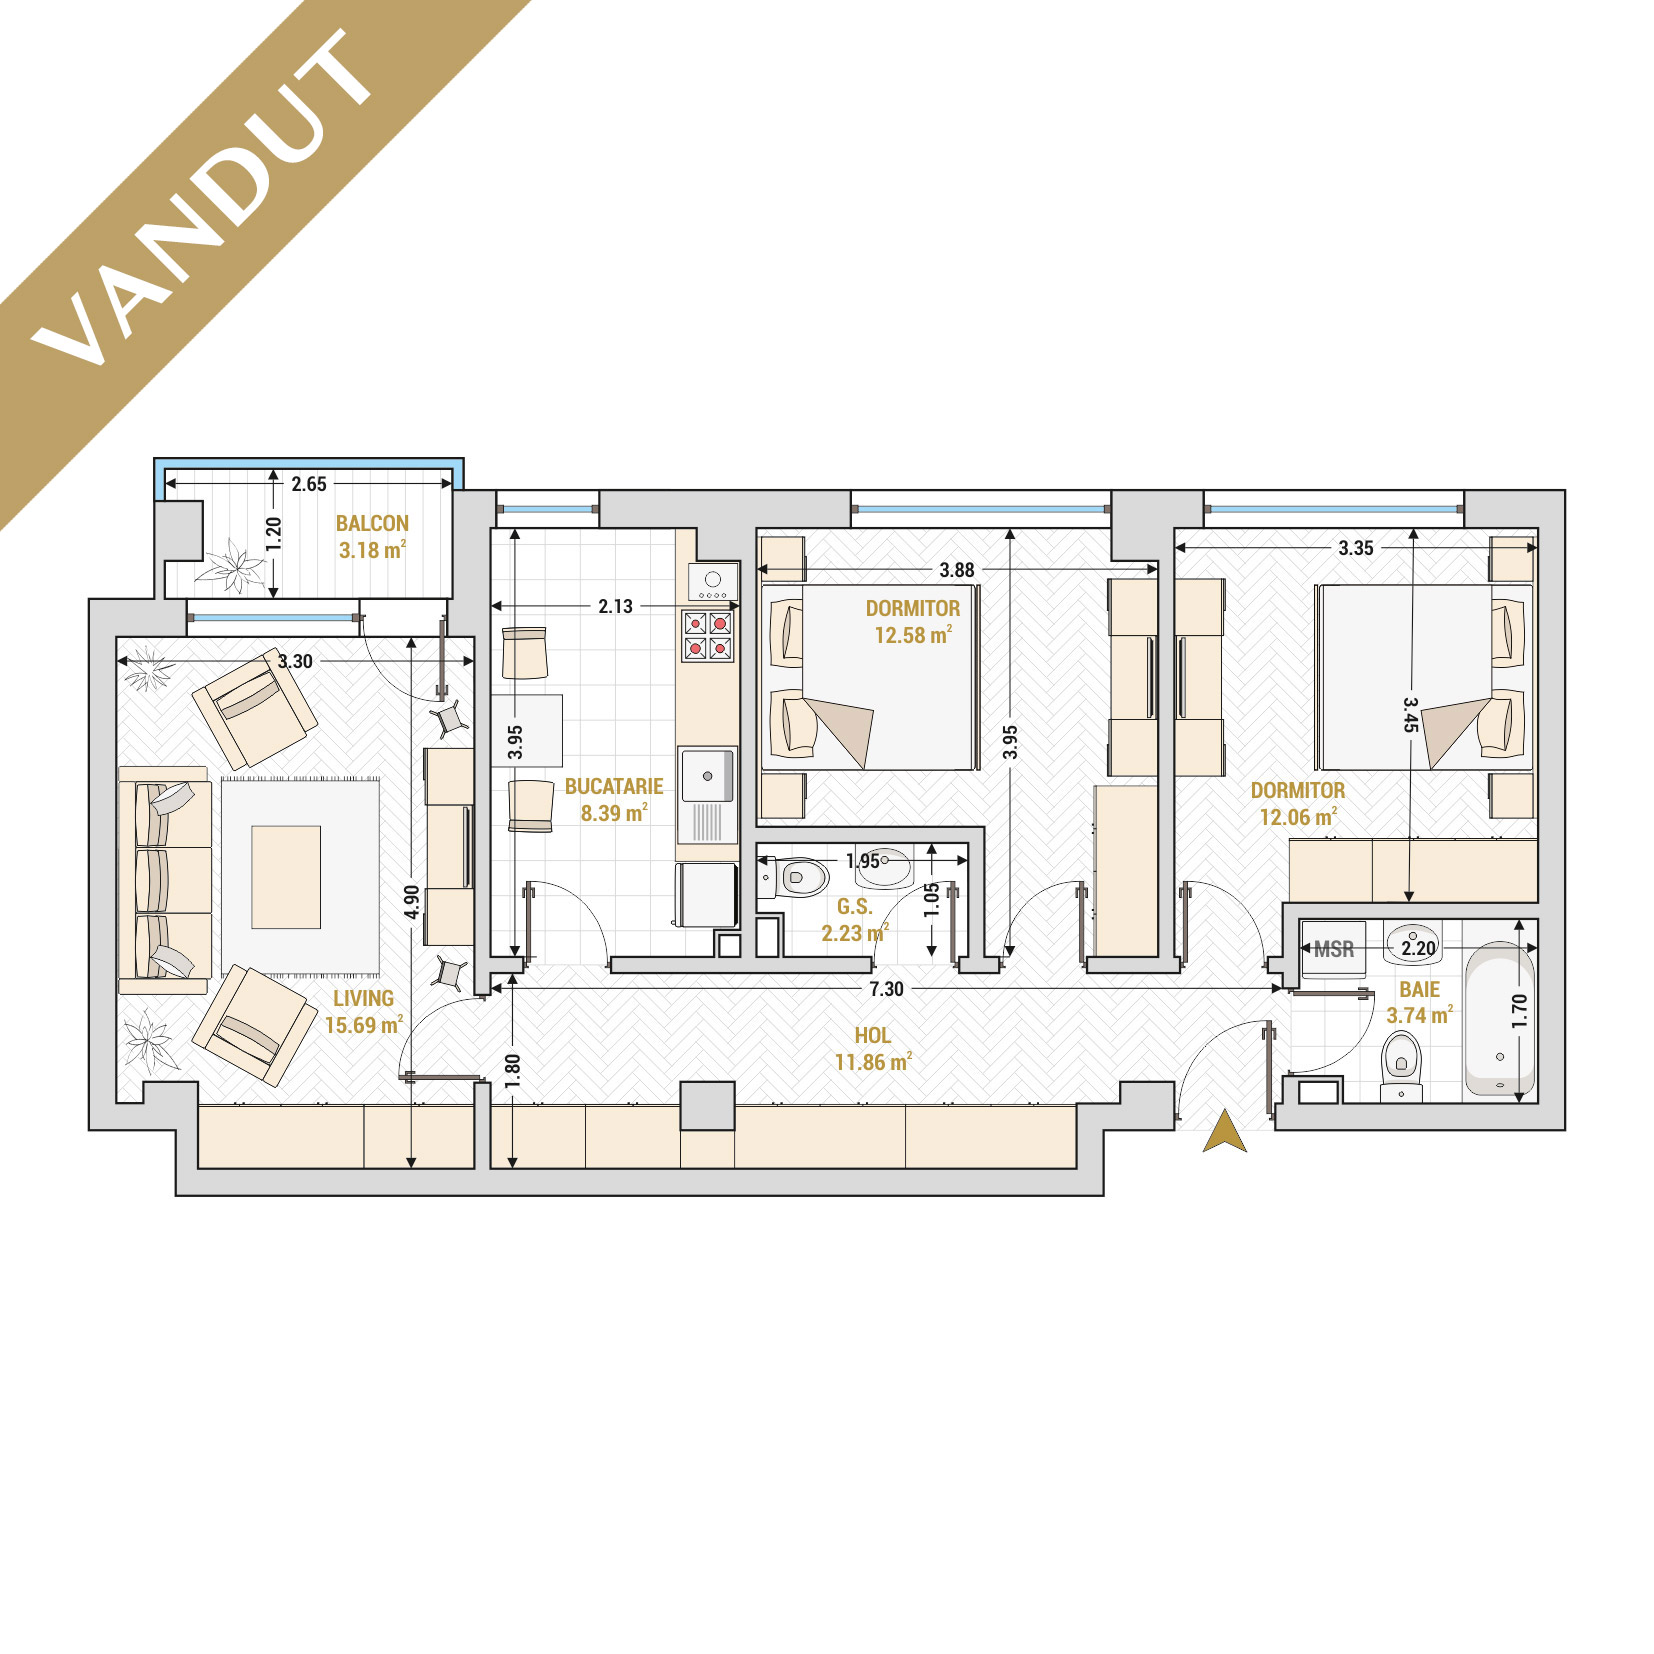 Apartament 3 camere de vanzare Bucuresti - Catedral Residence - Marriott, Piata Unirii, 13 Septembrie, Izvor - Tip 2 - T2A - V